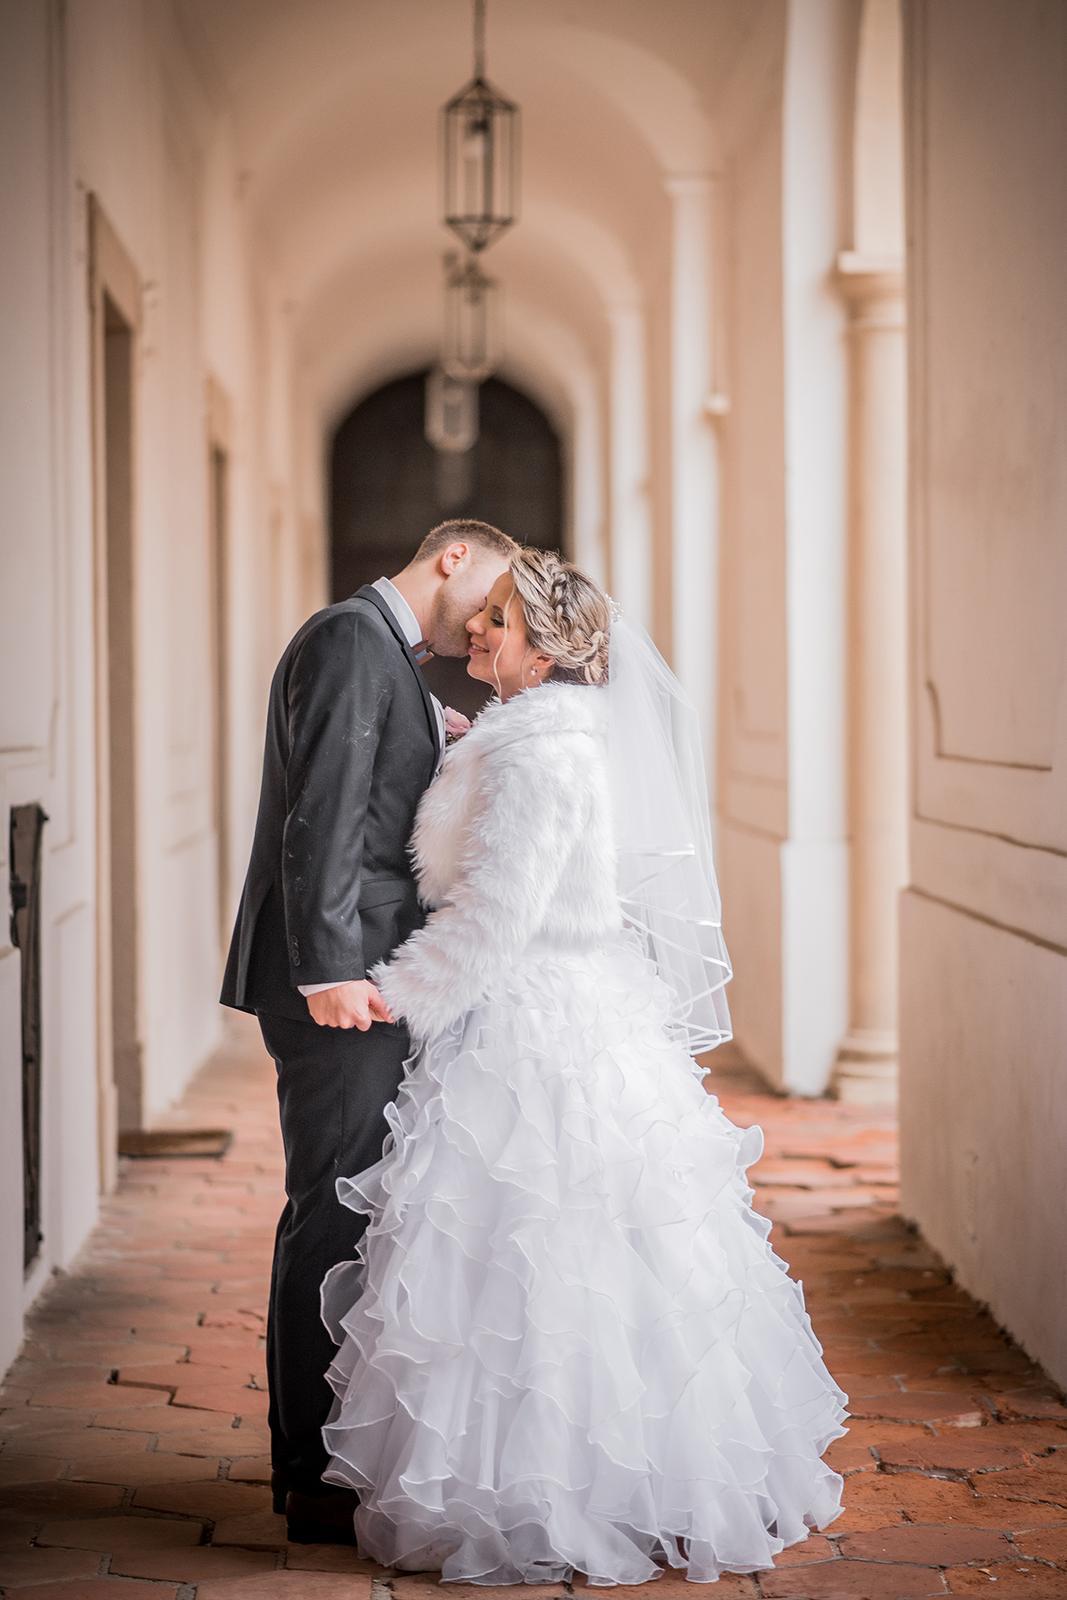 ♥ Zimní svatba ♥ Veronika & Jaroslav ♥ - Obrázok č. 3